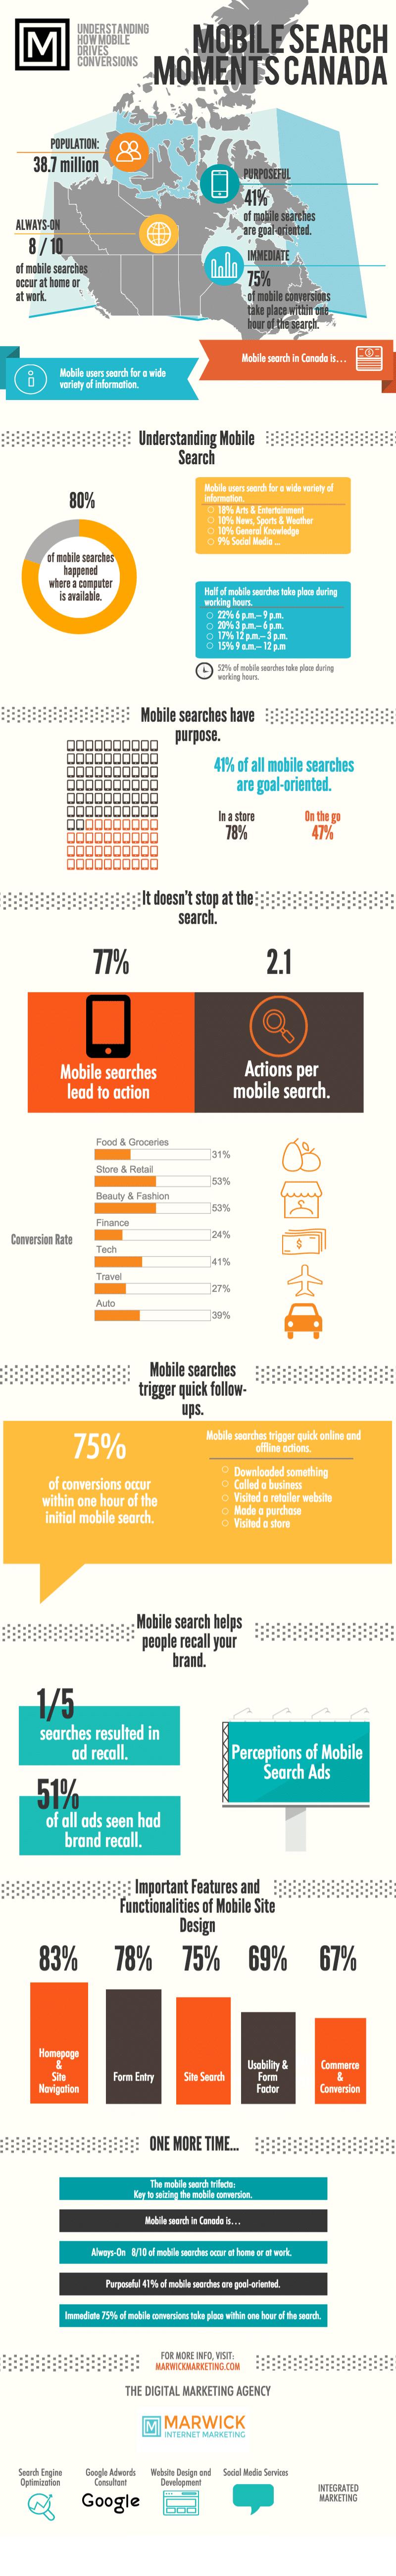 mobile-search-in-canada-marwick-marketing-short